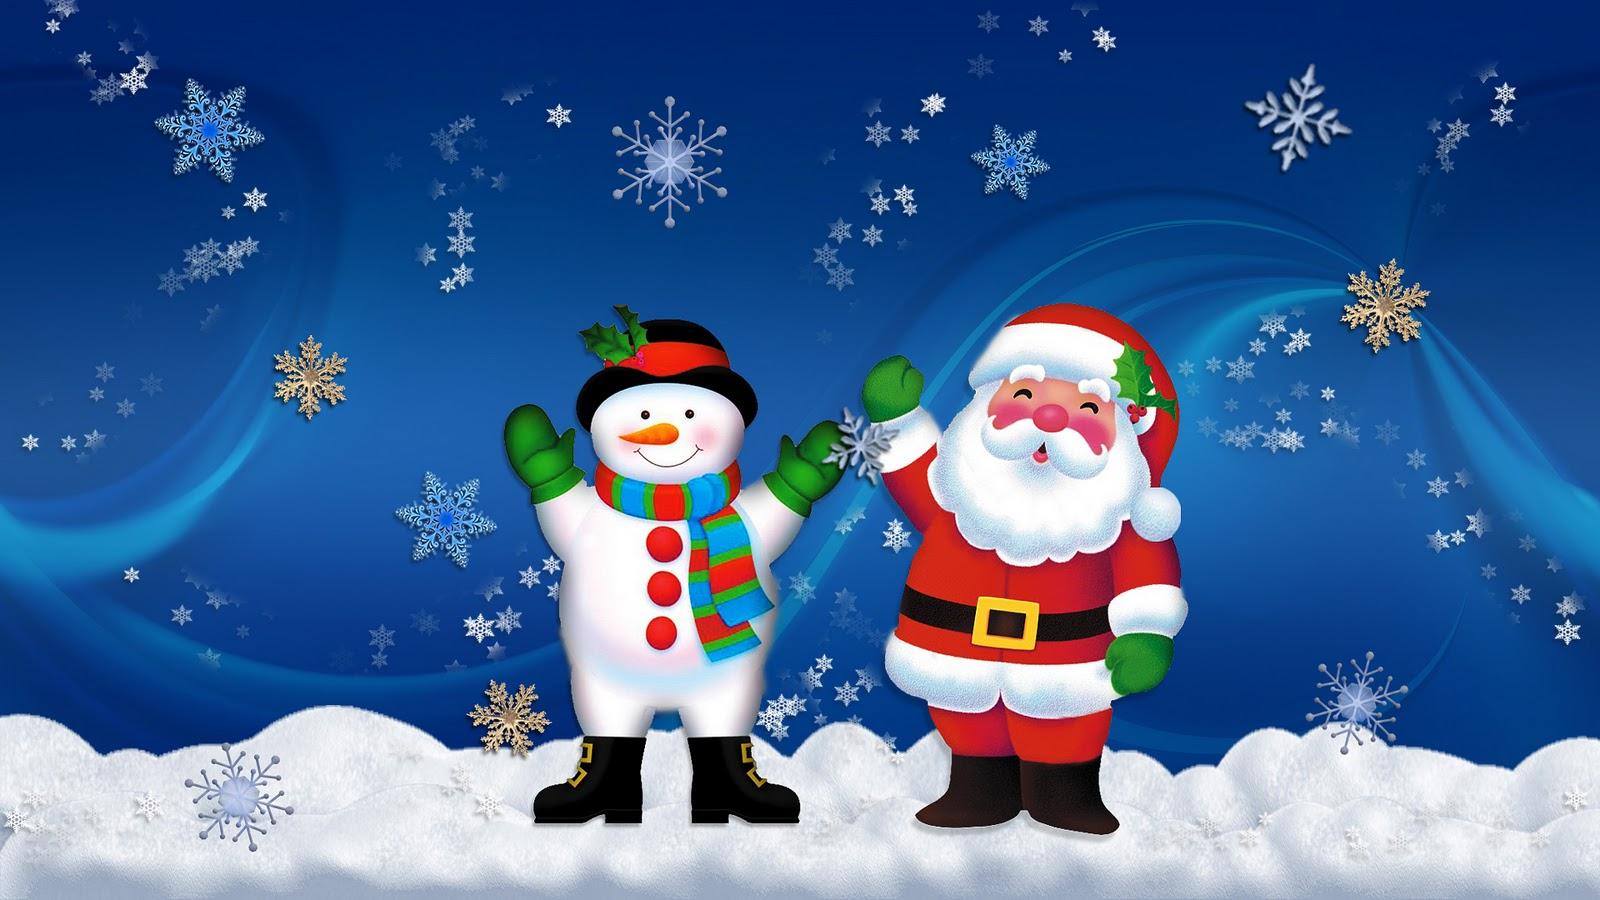 http://4.bp.blogspot.com/-m4D0T1Z0POc/Tq_StX8YpVI/AAAAAAAAP1Q/_WpA10ffFNU/s1600/Mooie-kerstman-achtergronden-leuke-kerstman-wallpapers-afbeelding-plaatje-foto-6.jpg